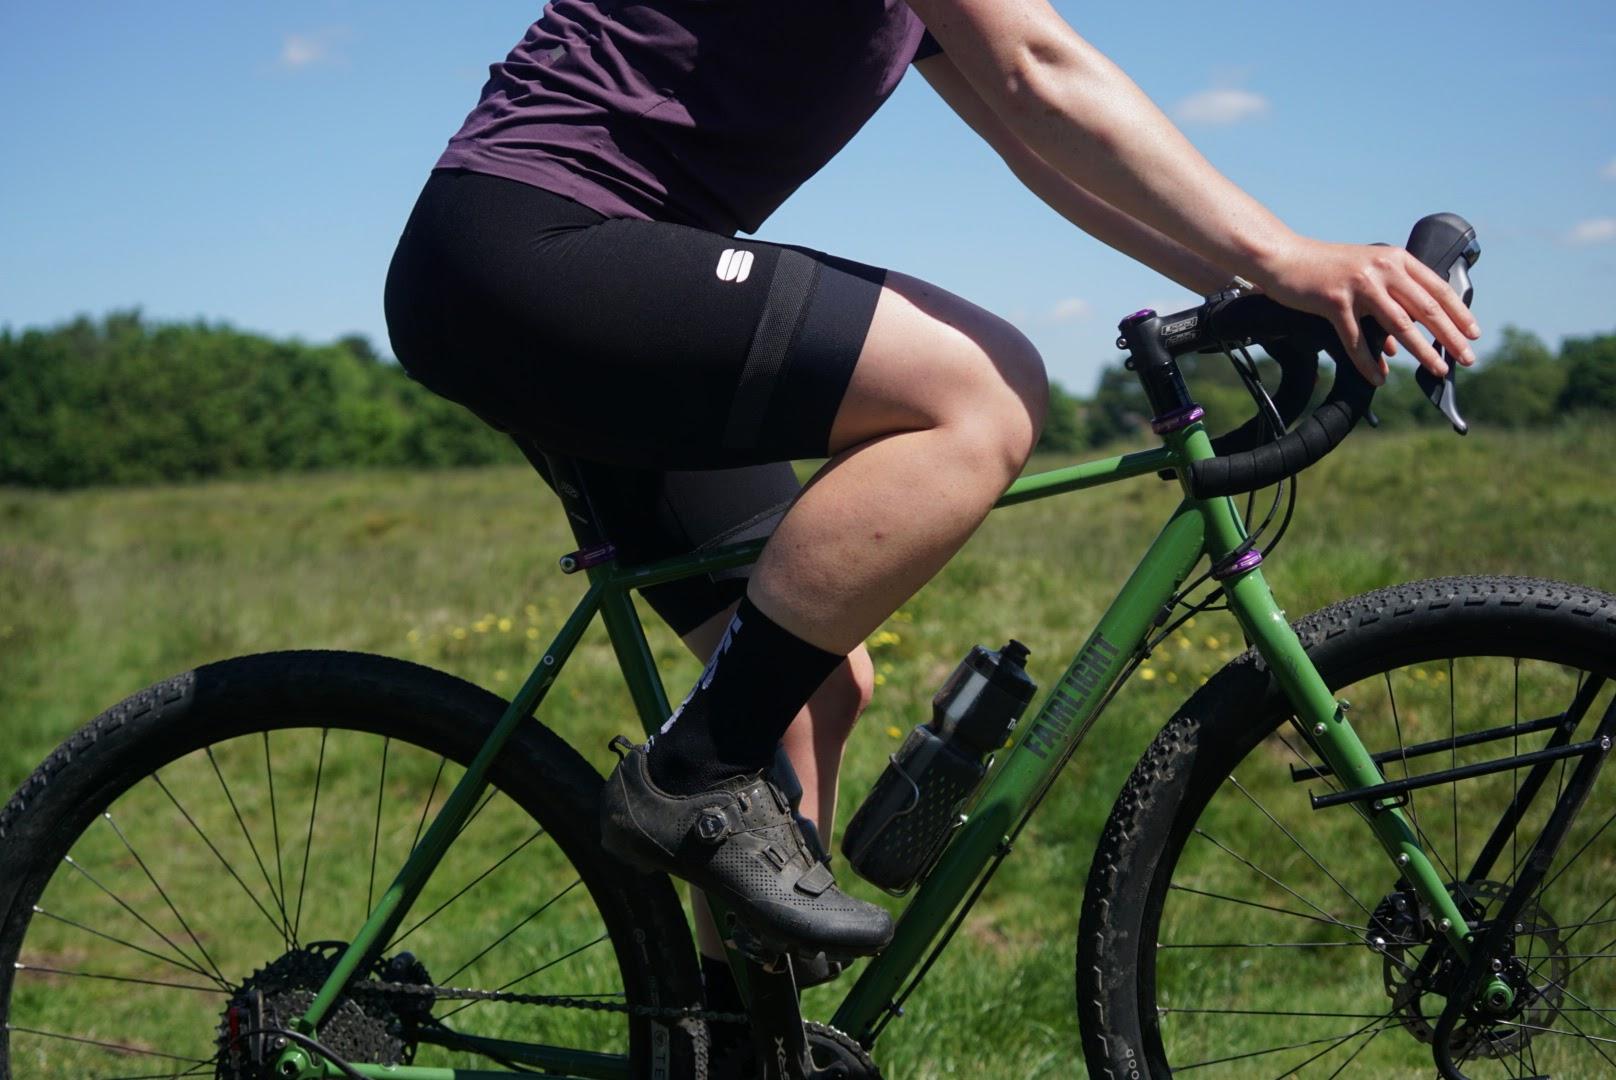 Sportful Supergiara bib shorts